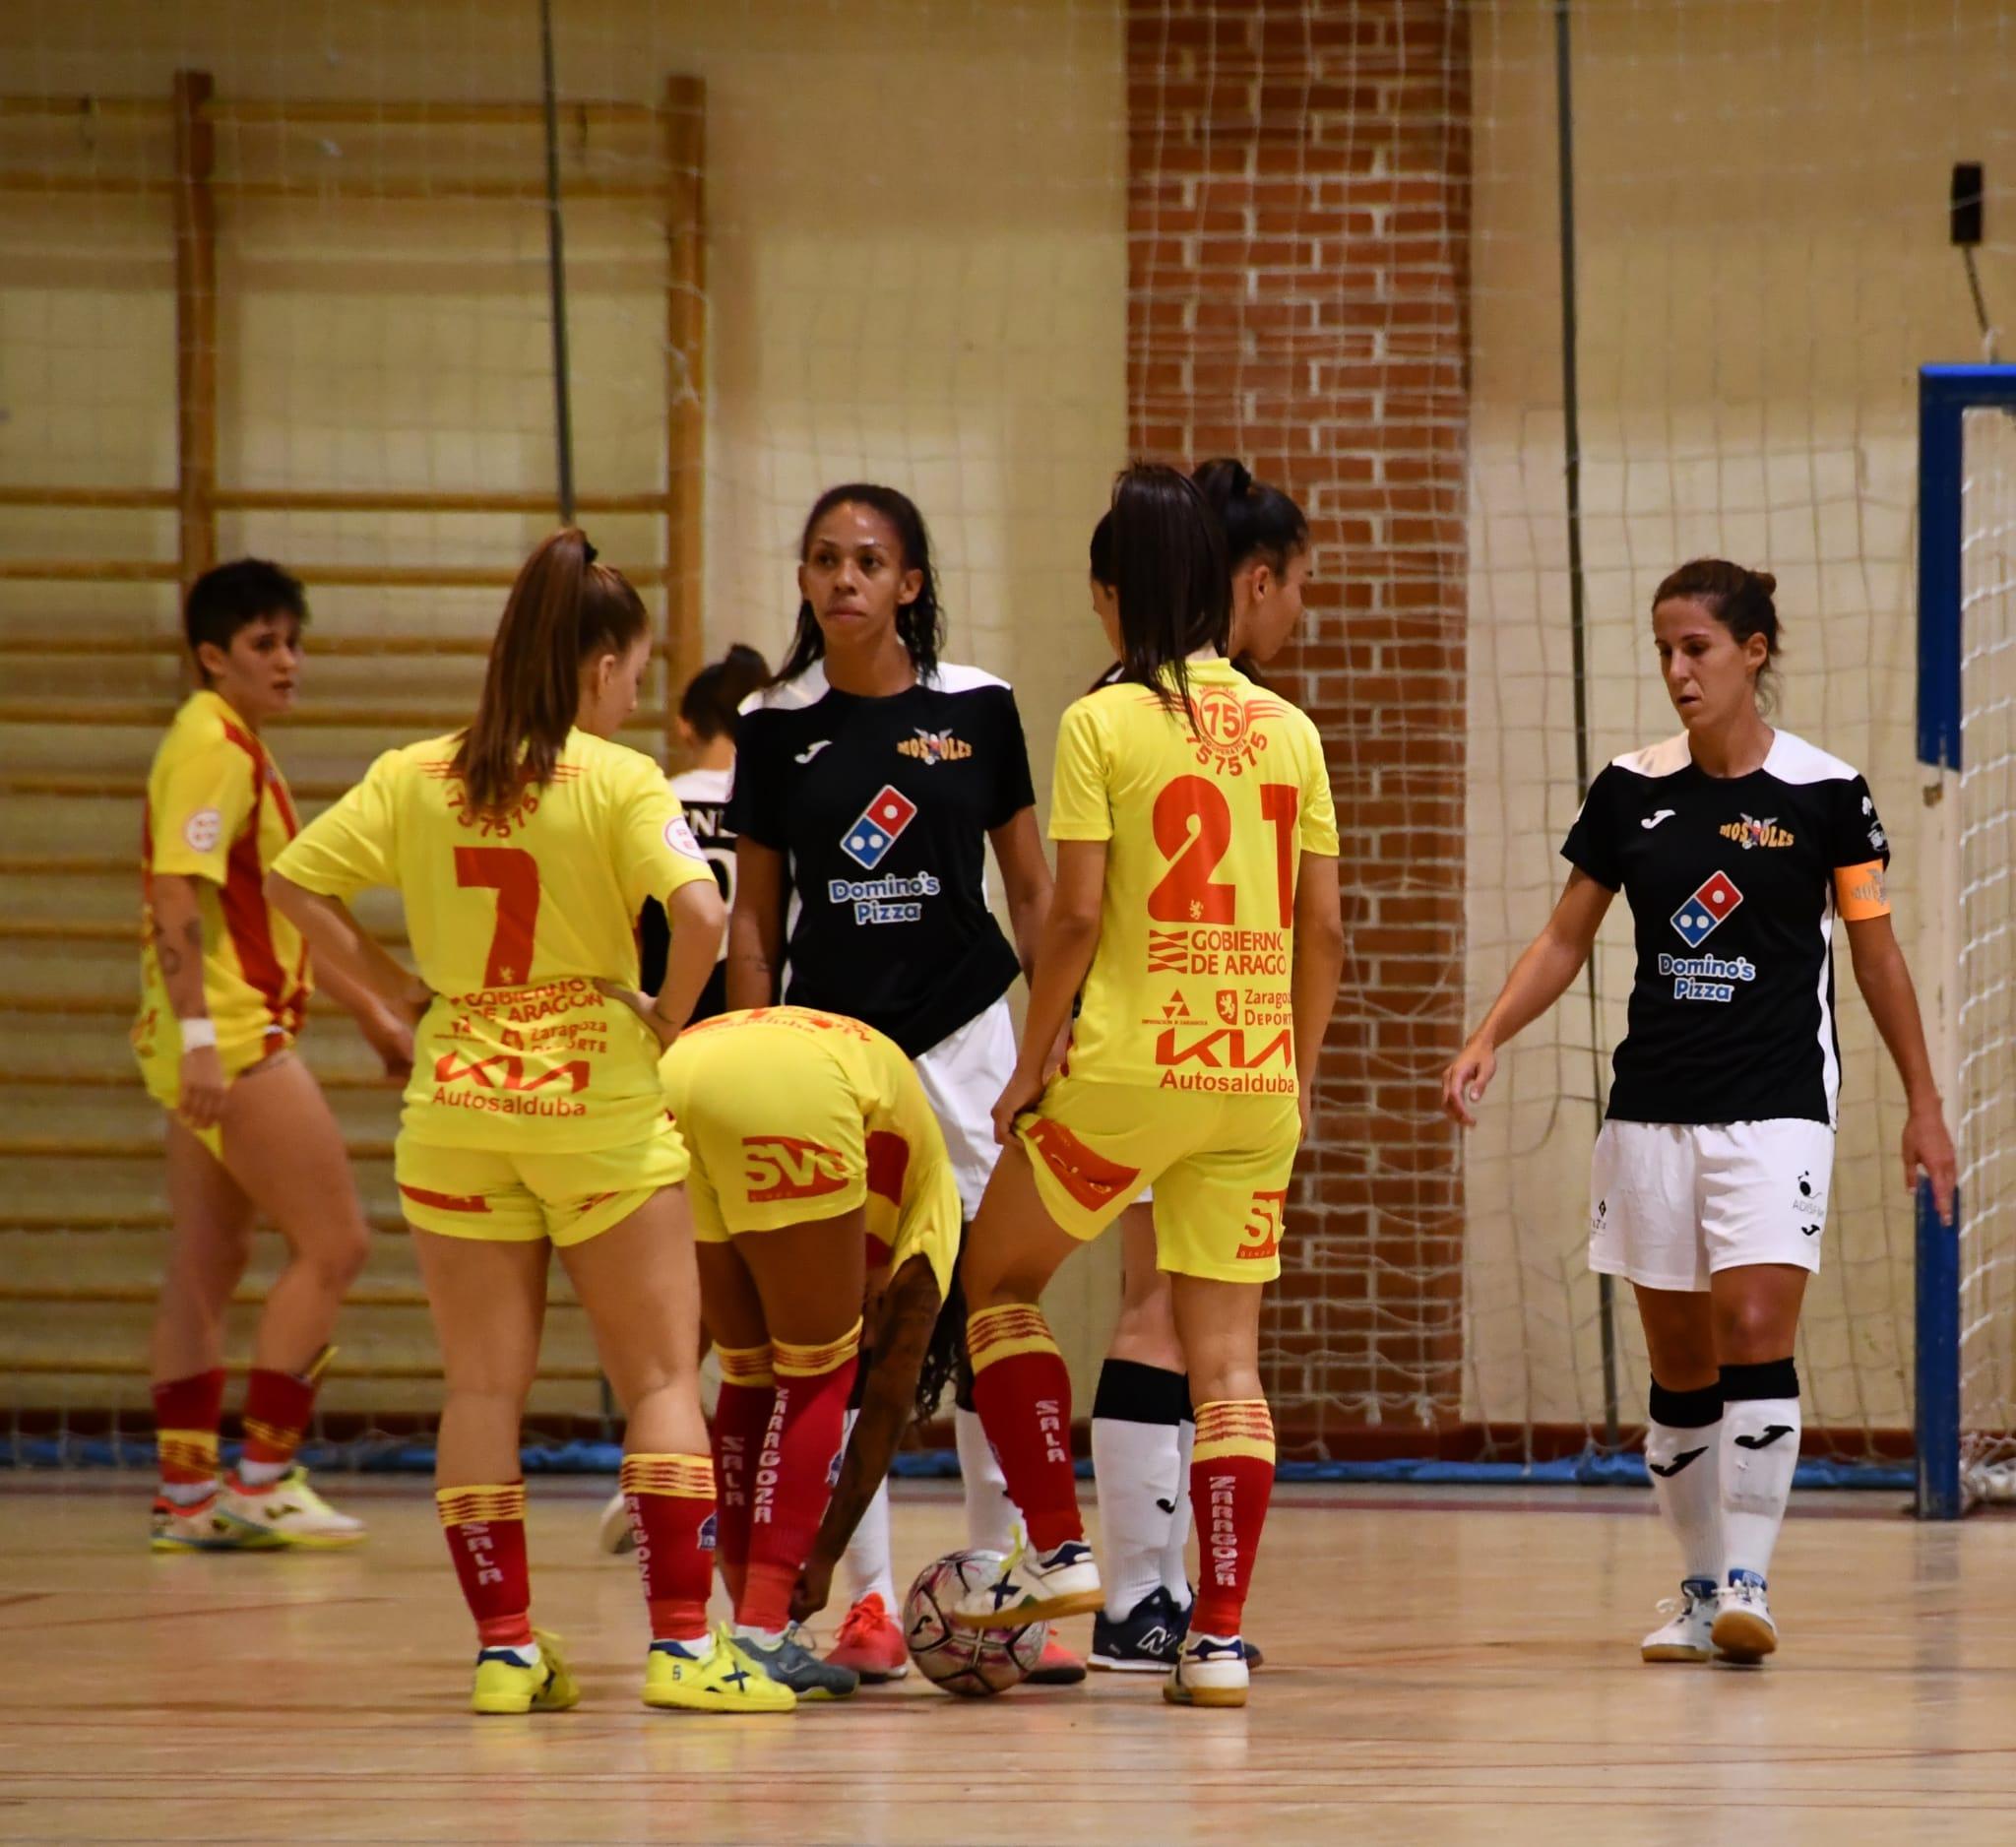 Crónica del Partido de Liga: FSF Mótoles - Sala Zaragoza. Jornada 3ª